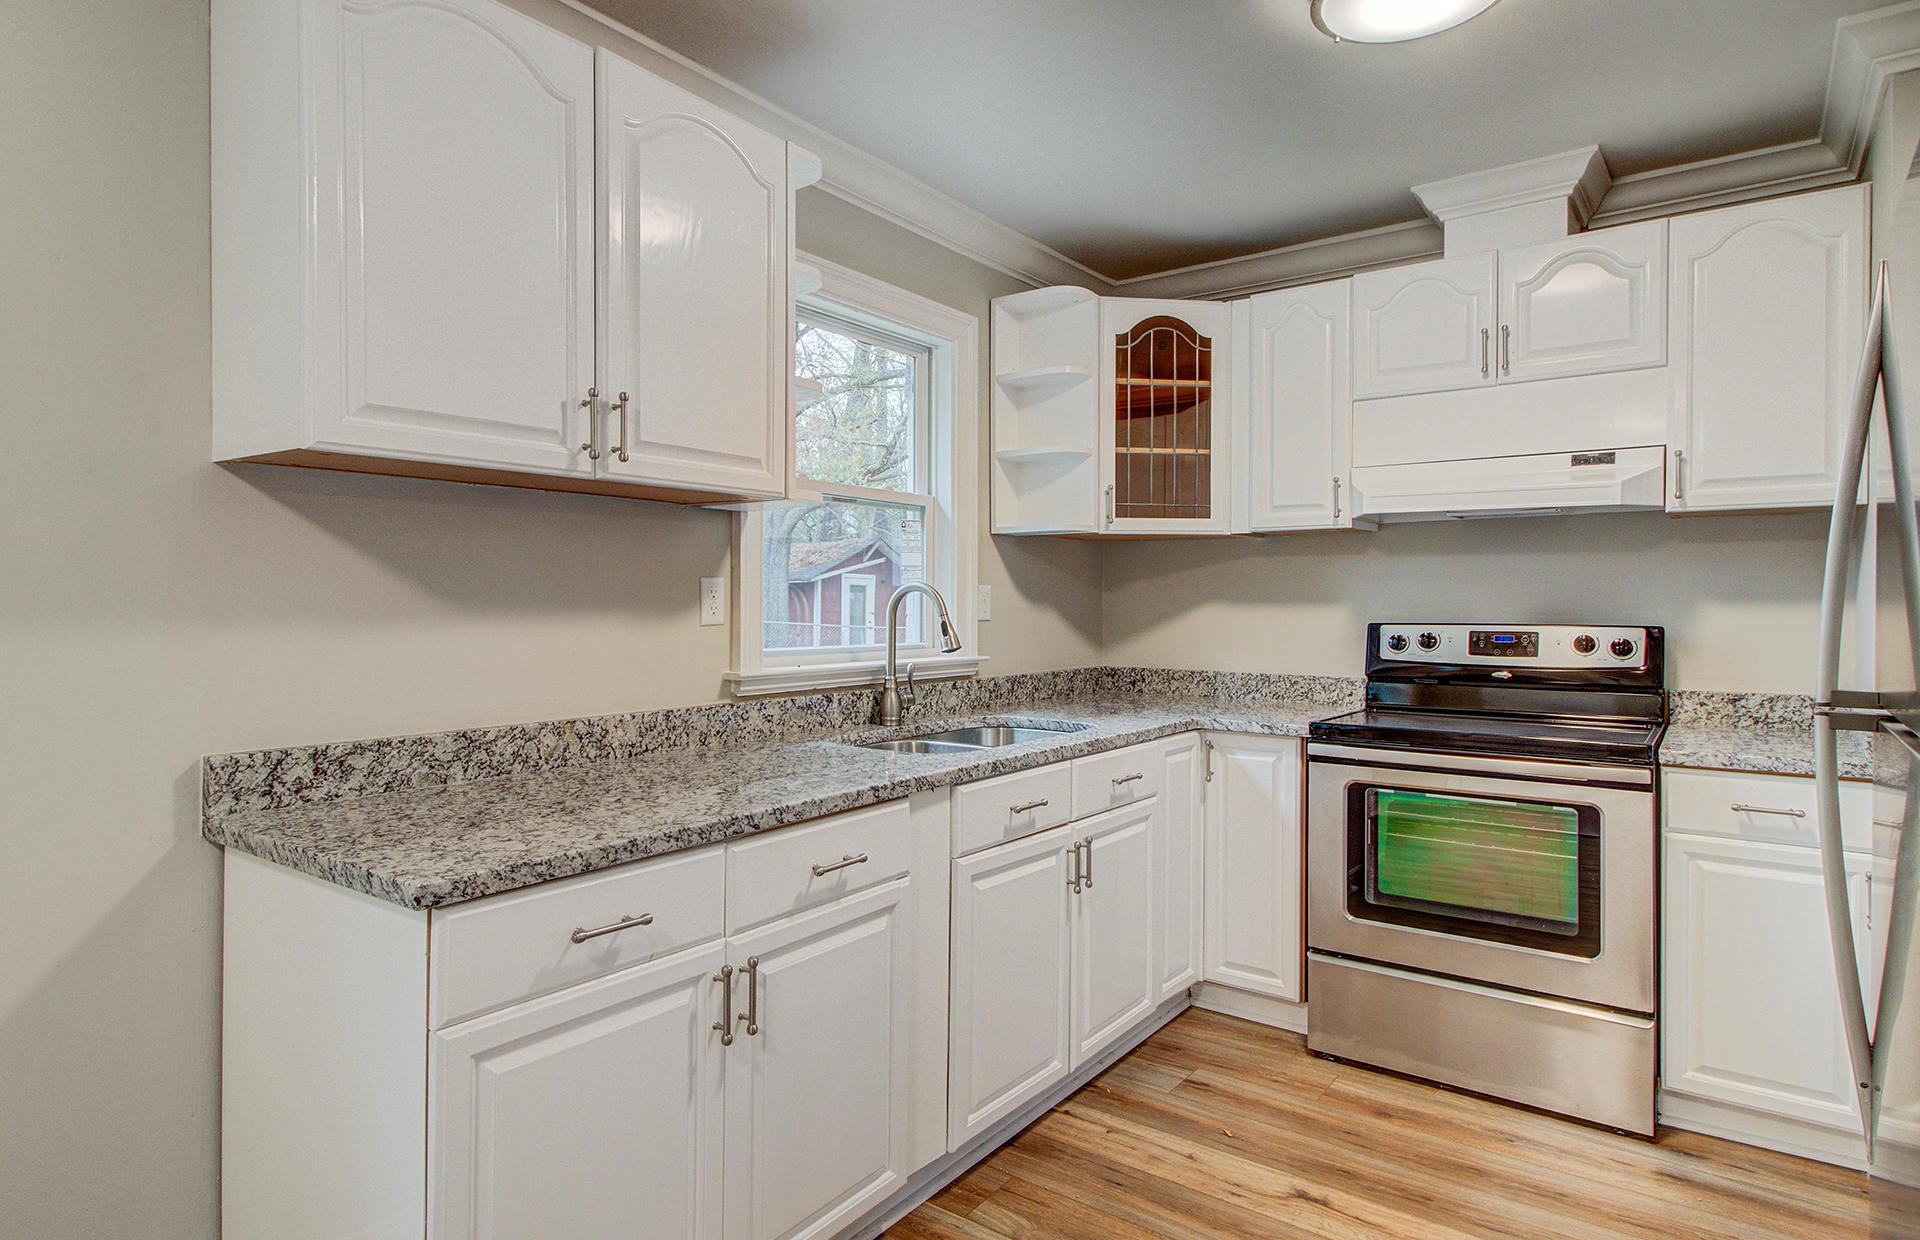 Sedgefield Section I Homes For Sale - 30 Aldene, Goose Creek, SC - 16